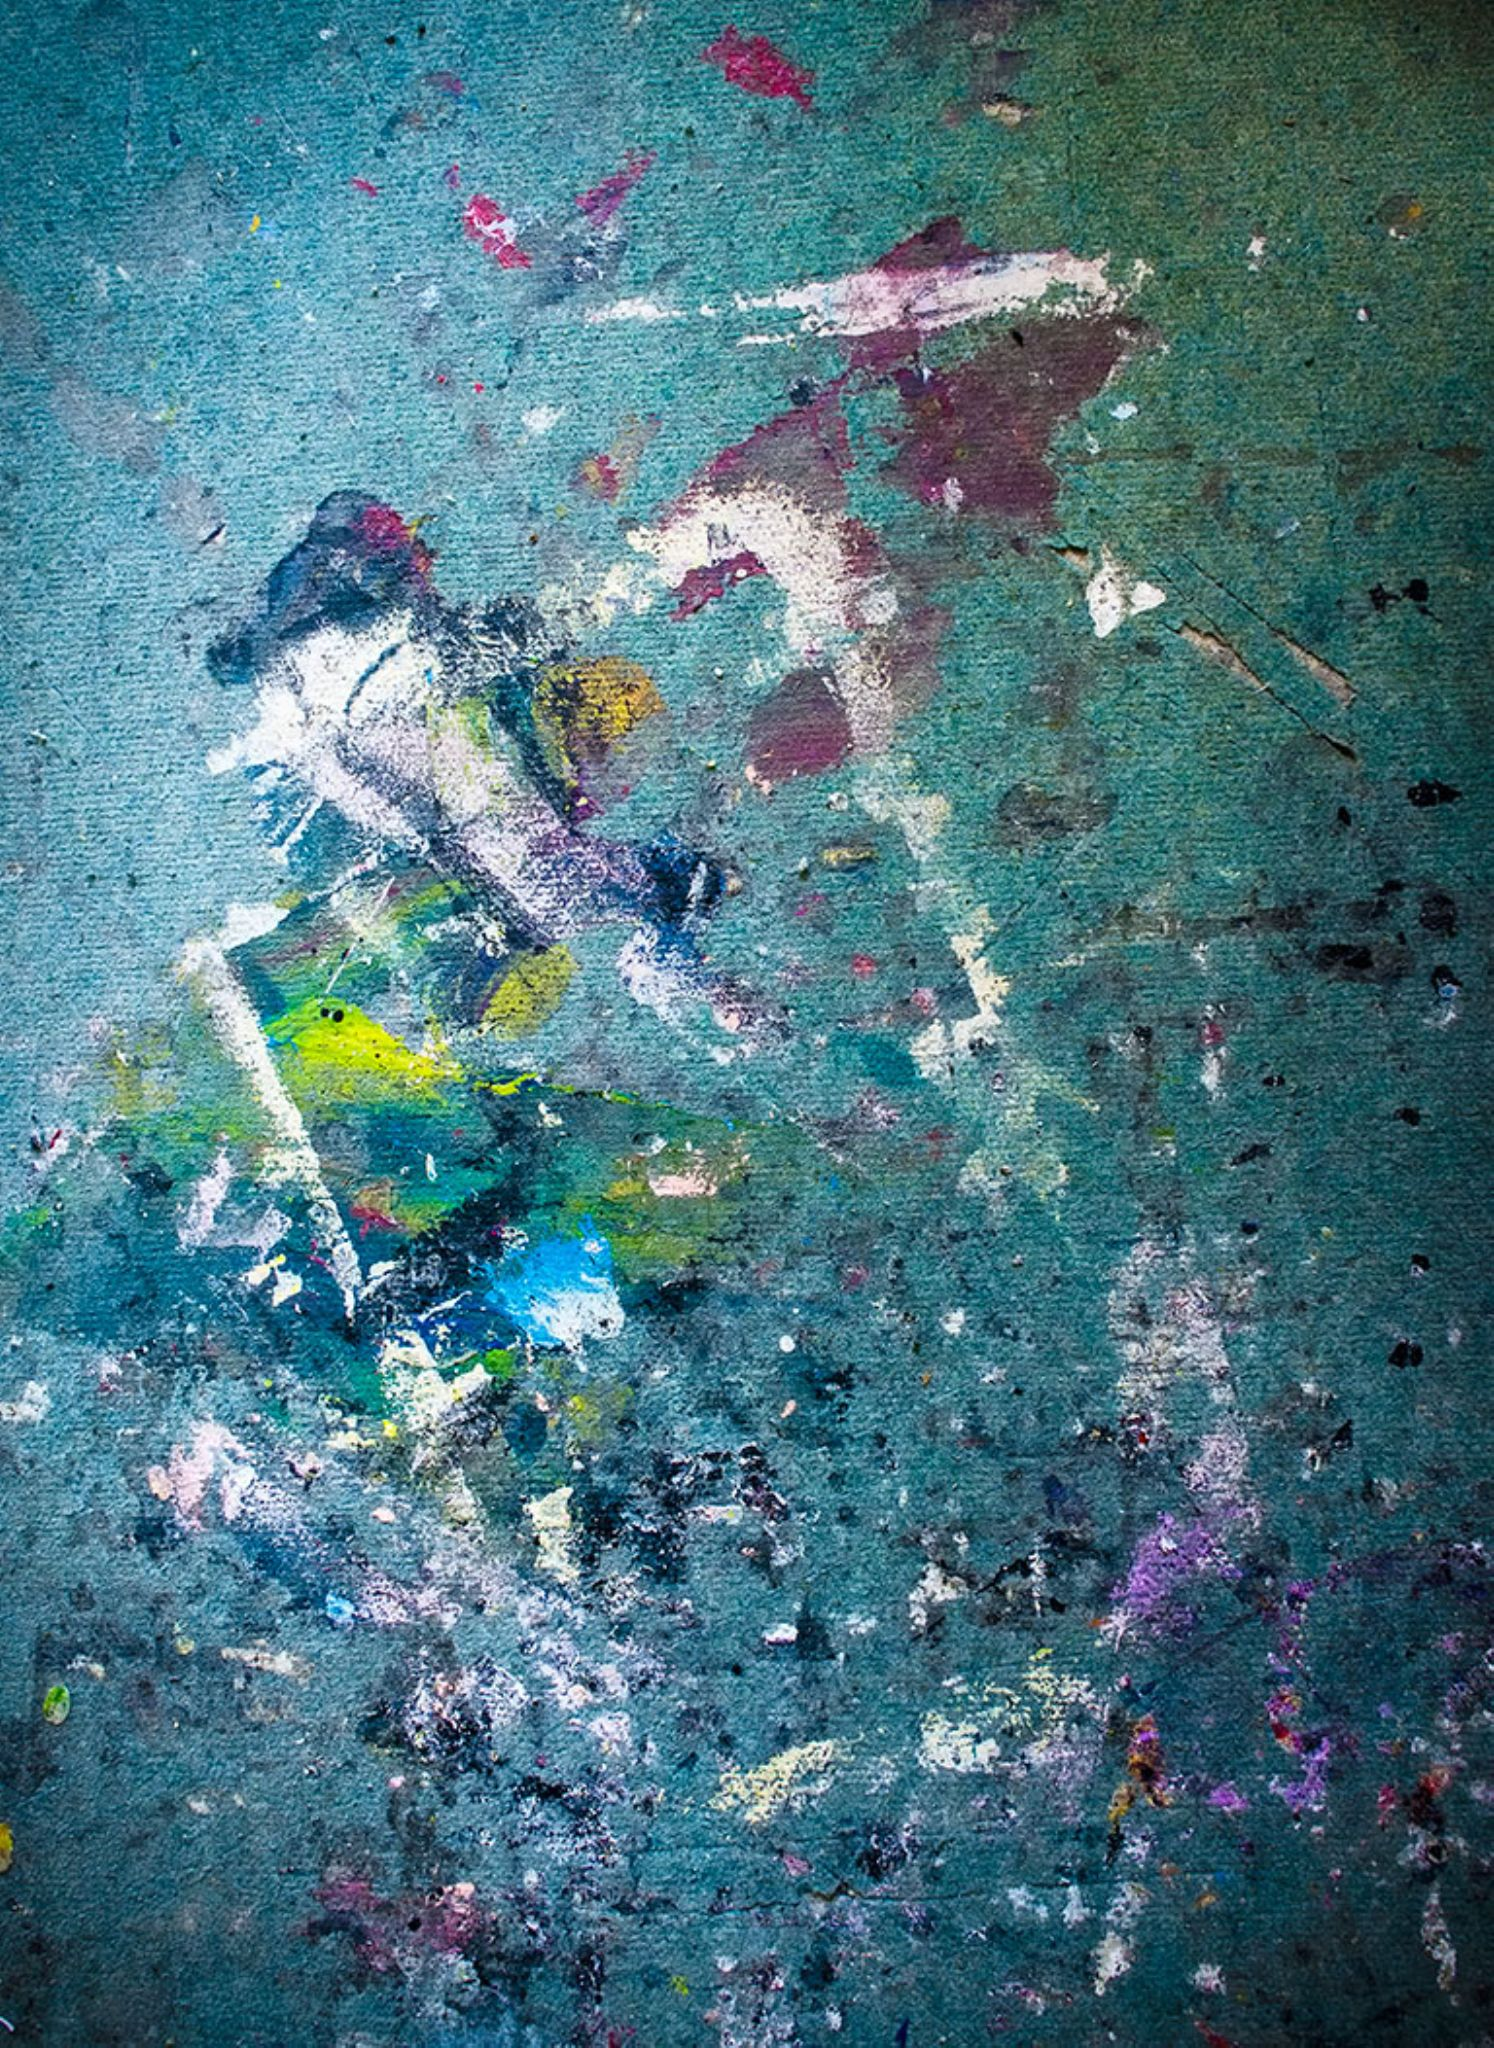 The artist's carpet by DavidNorfolk